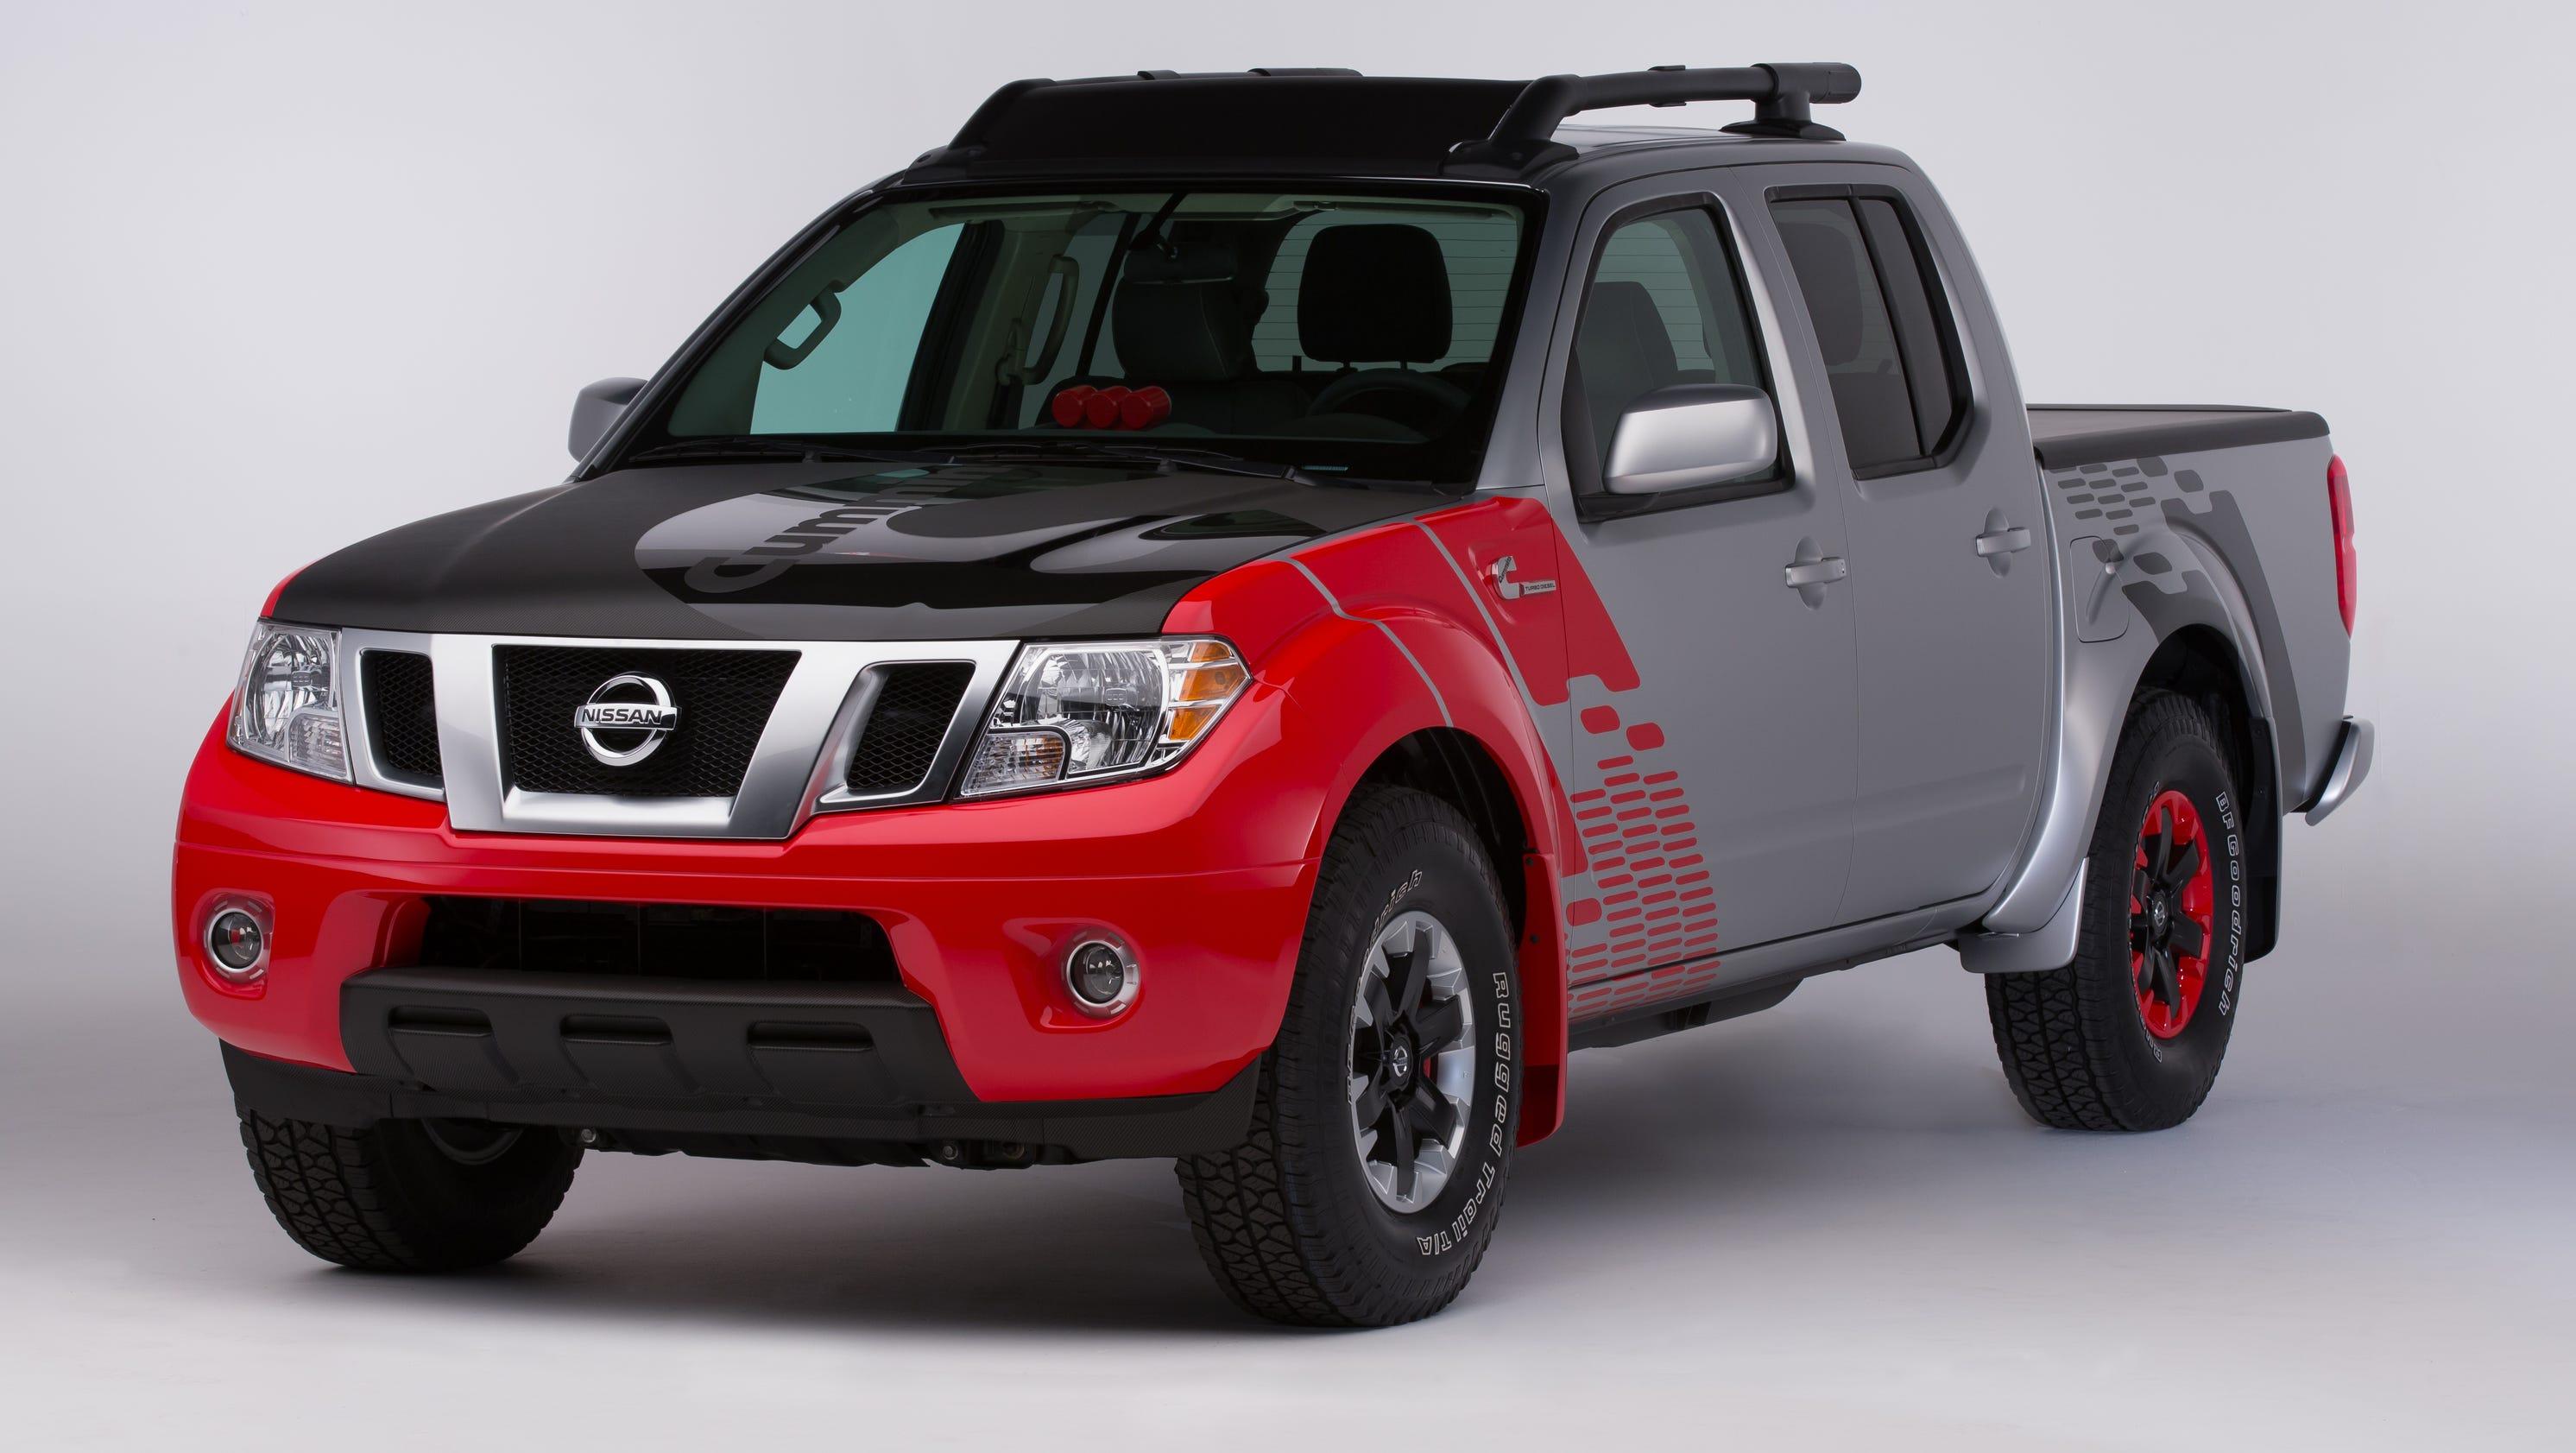 Nissan Frontier Diesel >> Nissan shows Cummins-diesel Frontier pickup